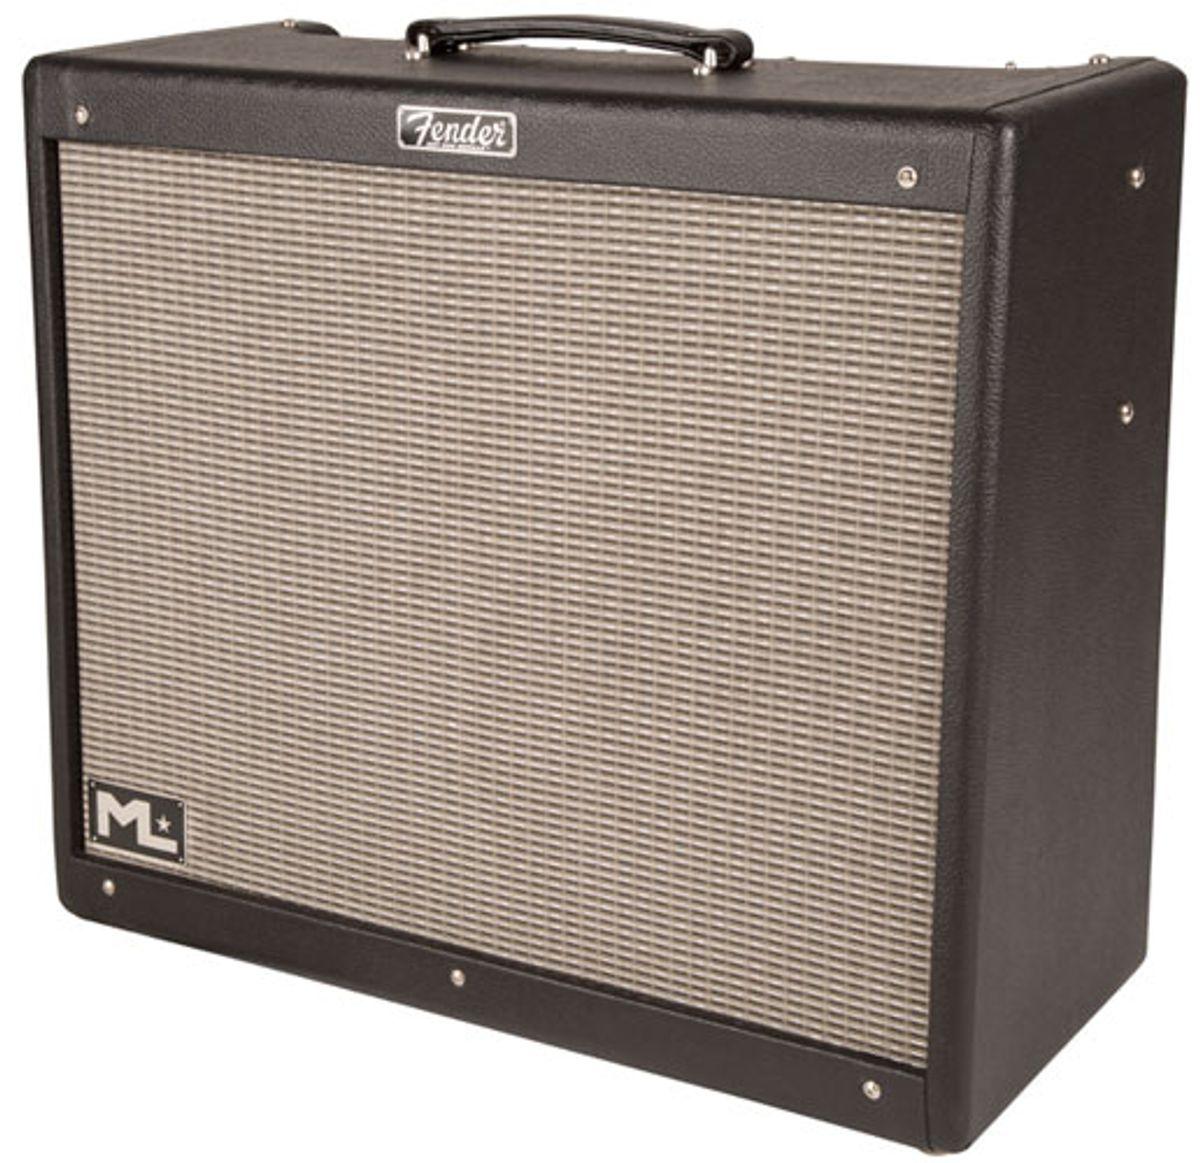 Fender Announces Michael Landau Signature Amplifier